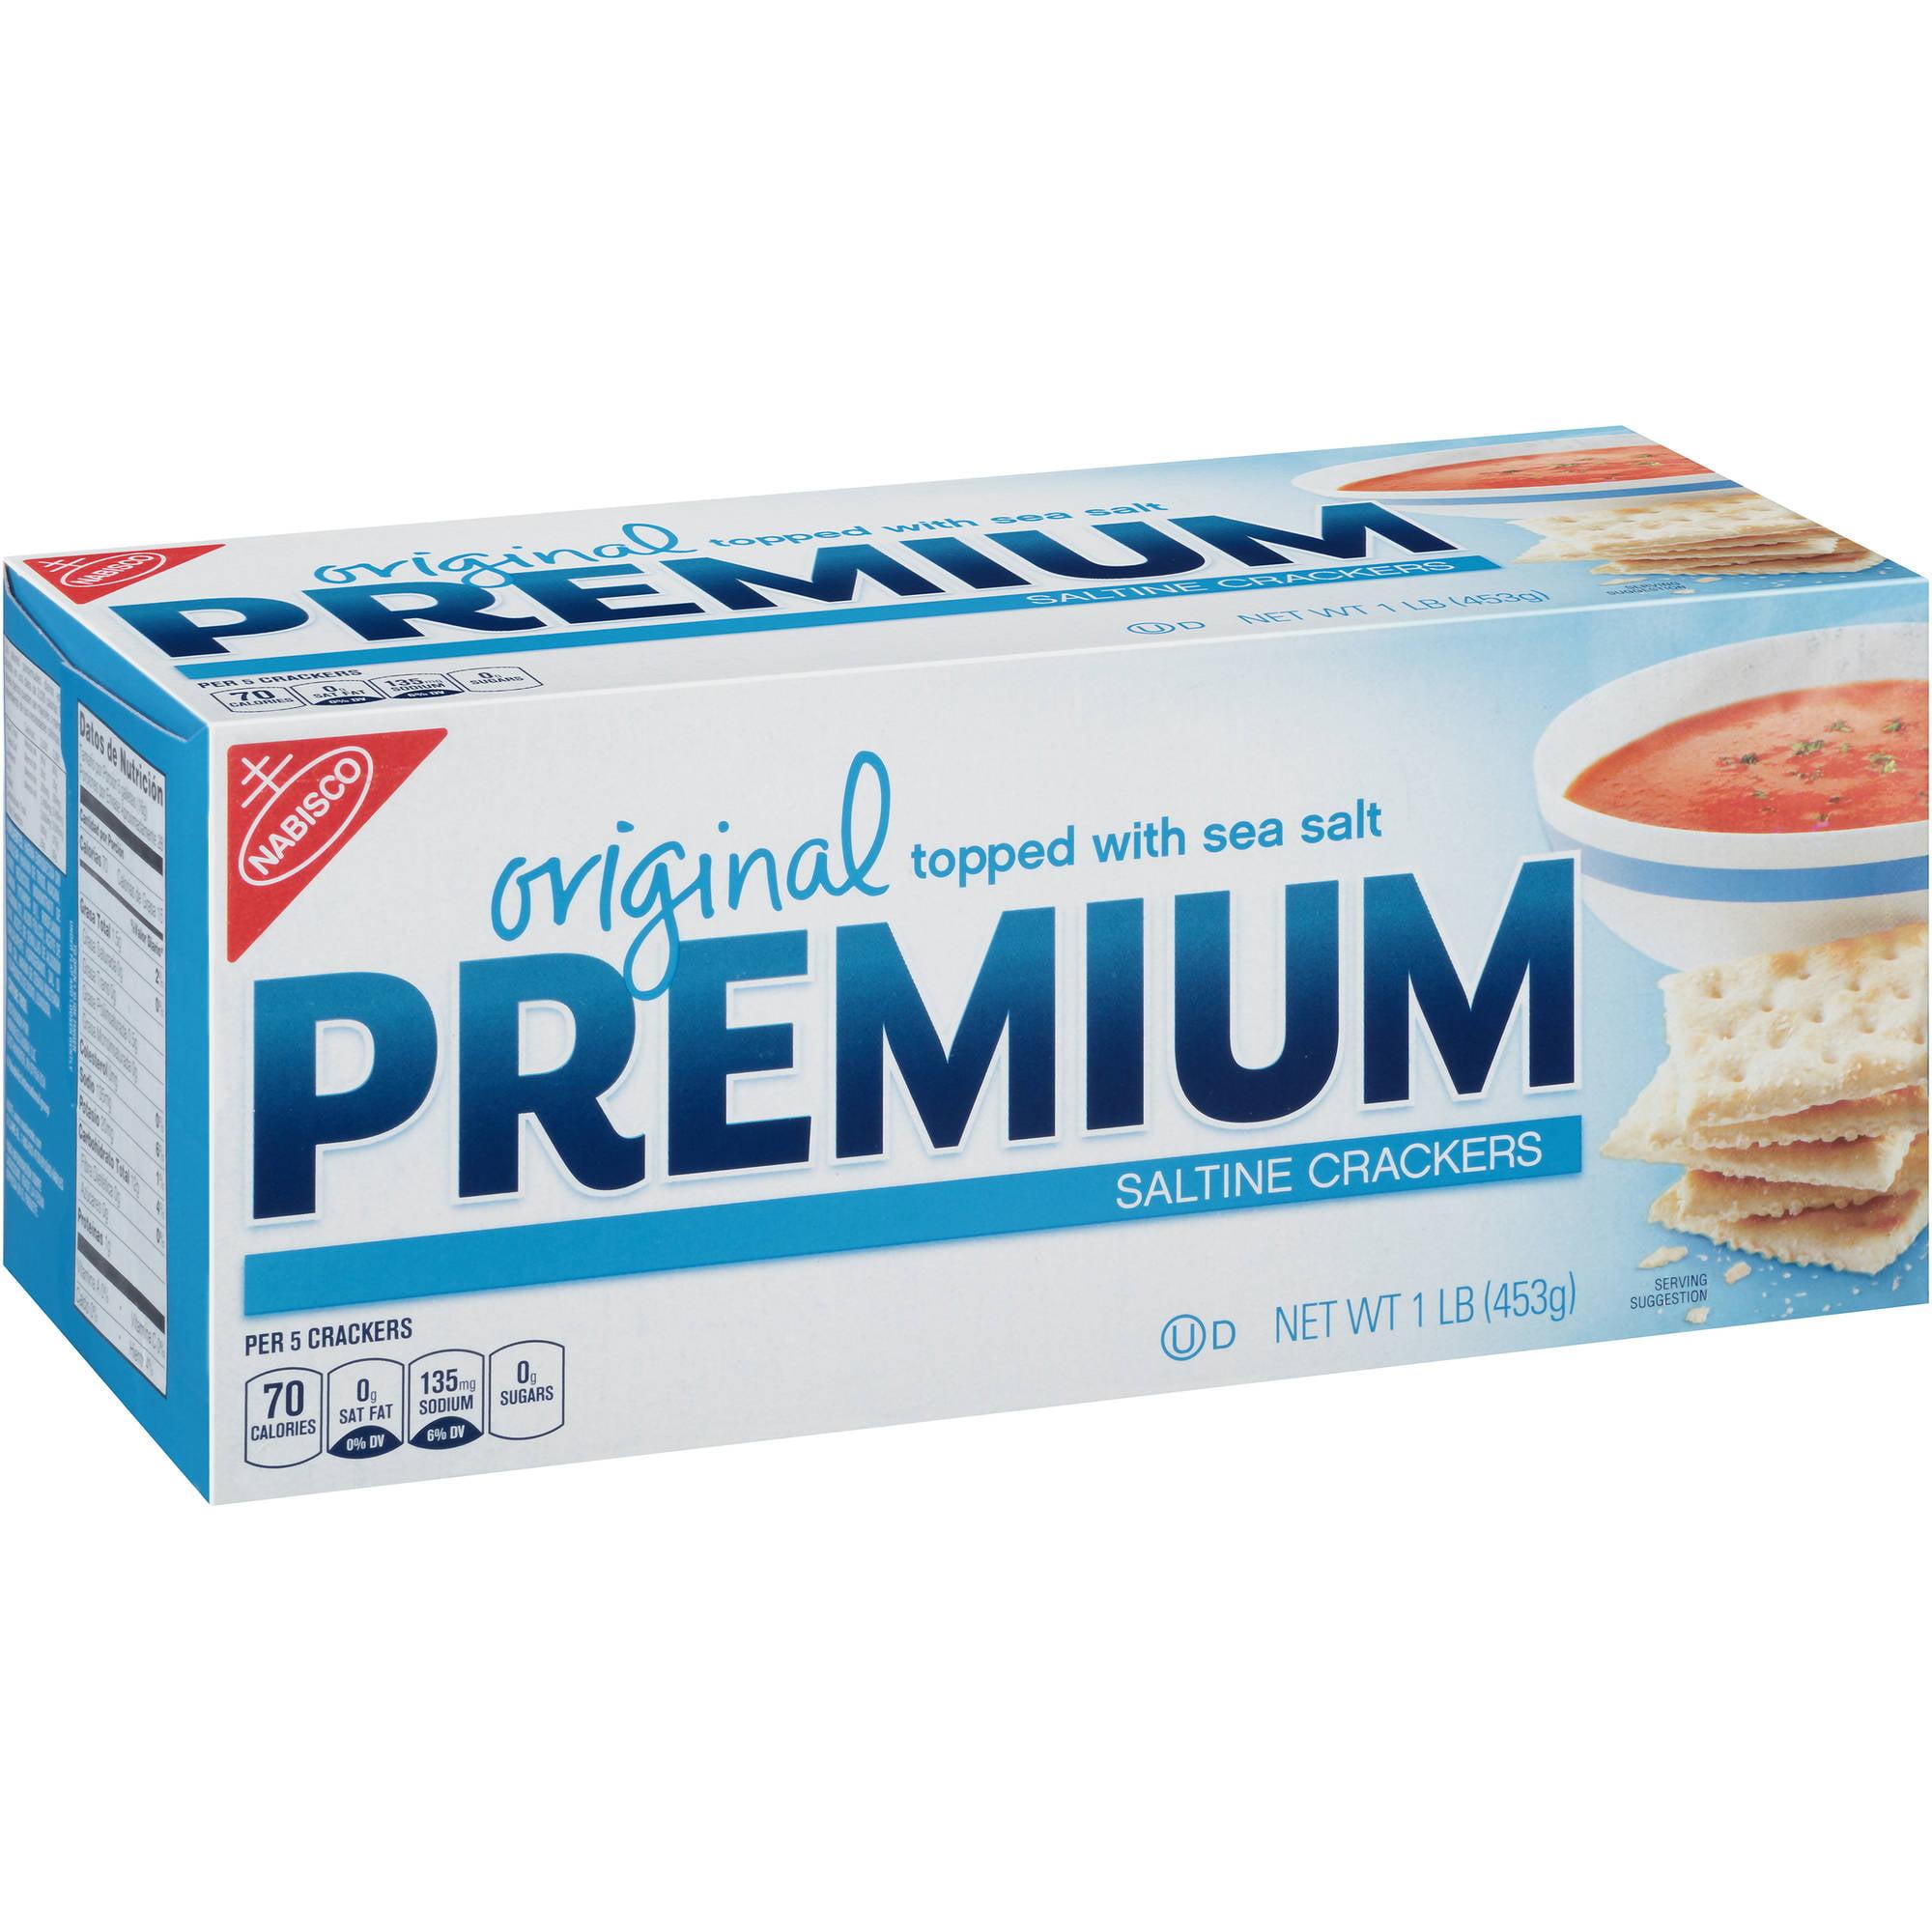 Nabisco Original Premium Saltine Crackers, 16 oz